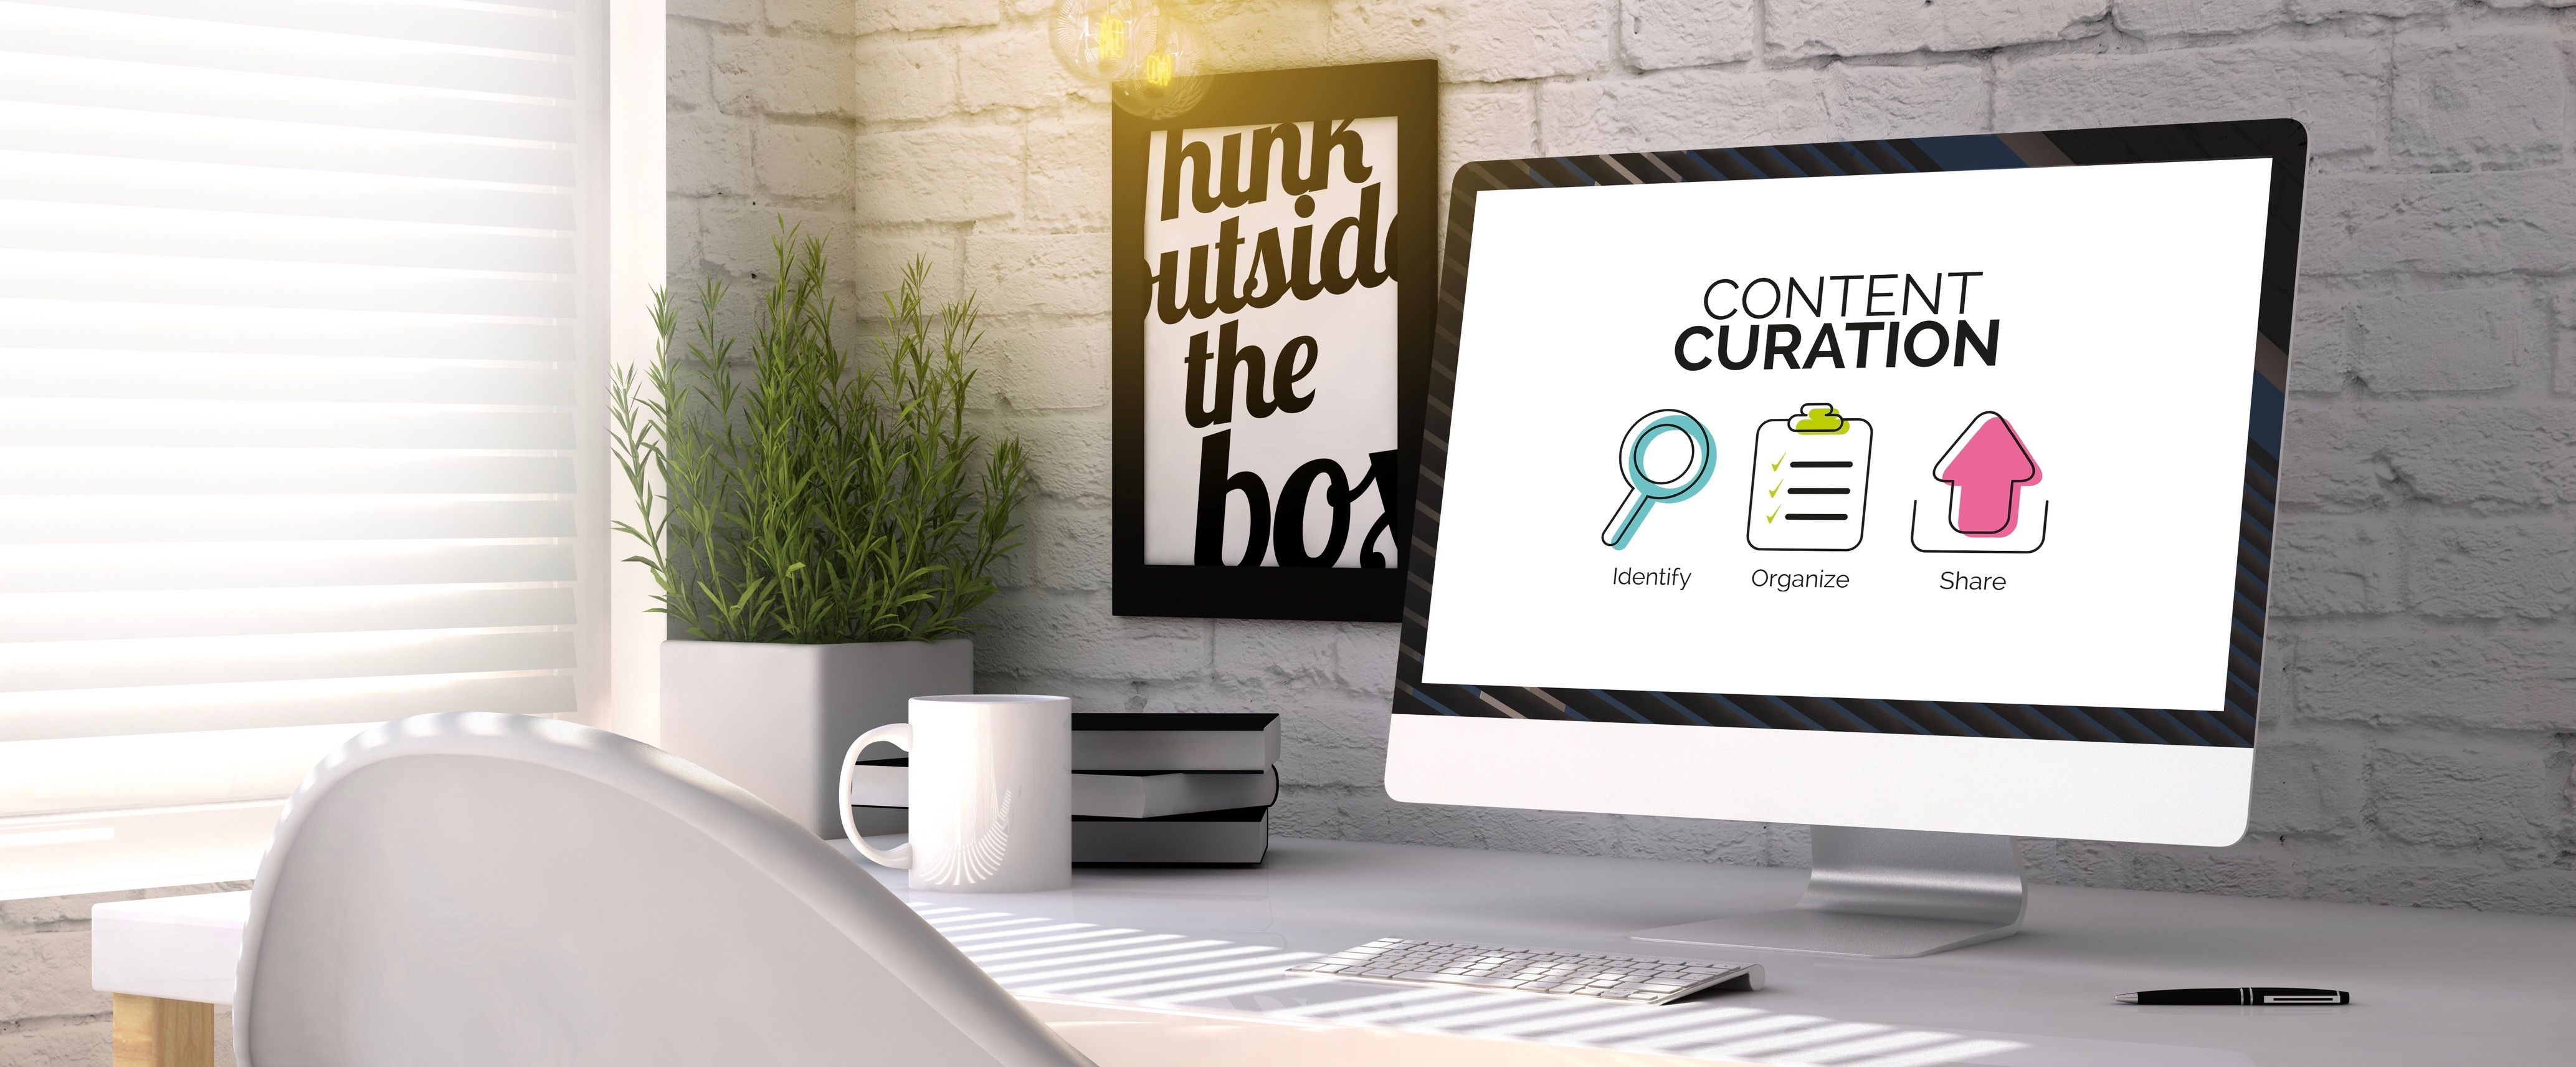 Content_Curation_Sources-compressor.jpg